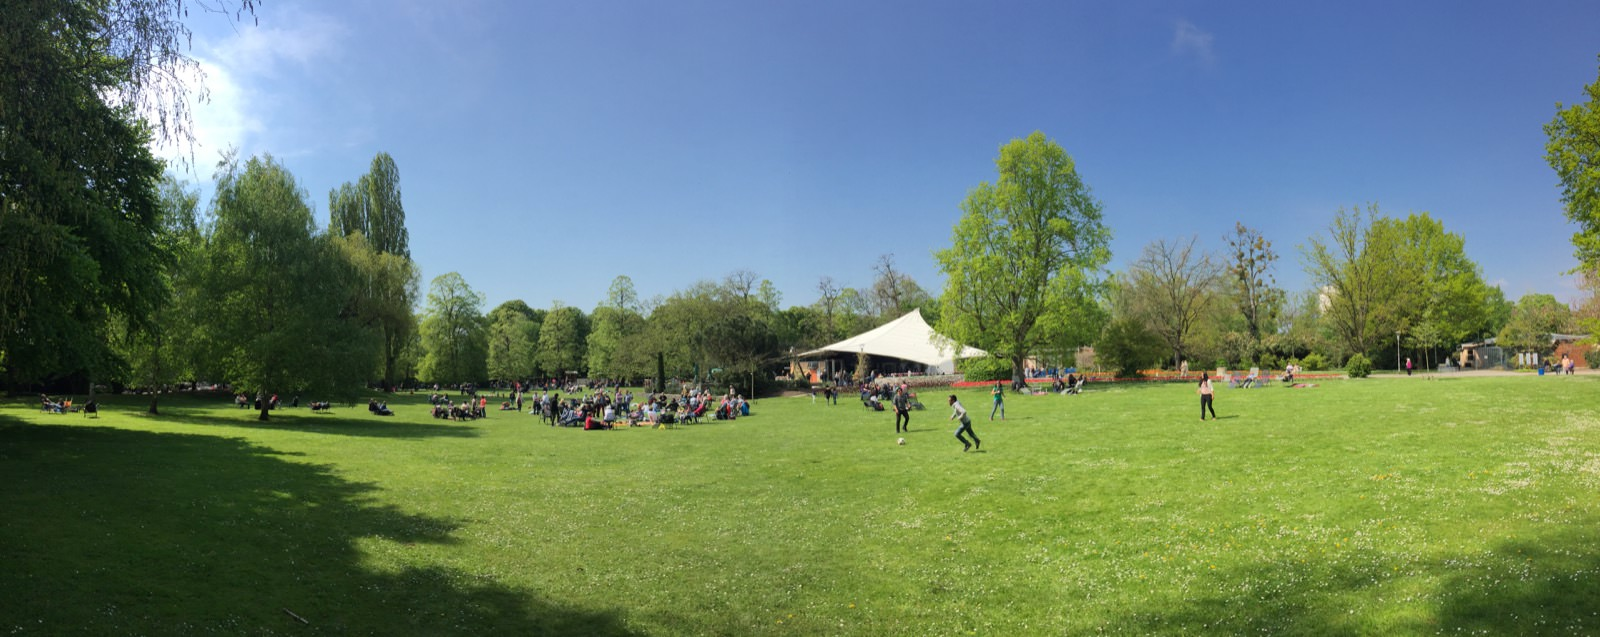 Sommer im Herzogenriedpark | Foto: M. Schülke